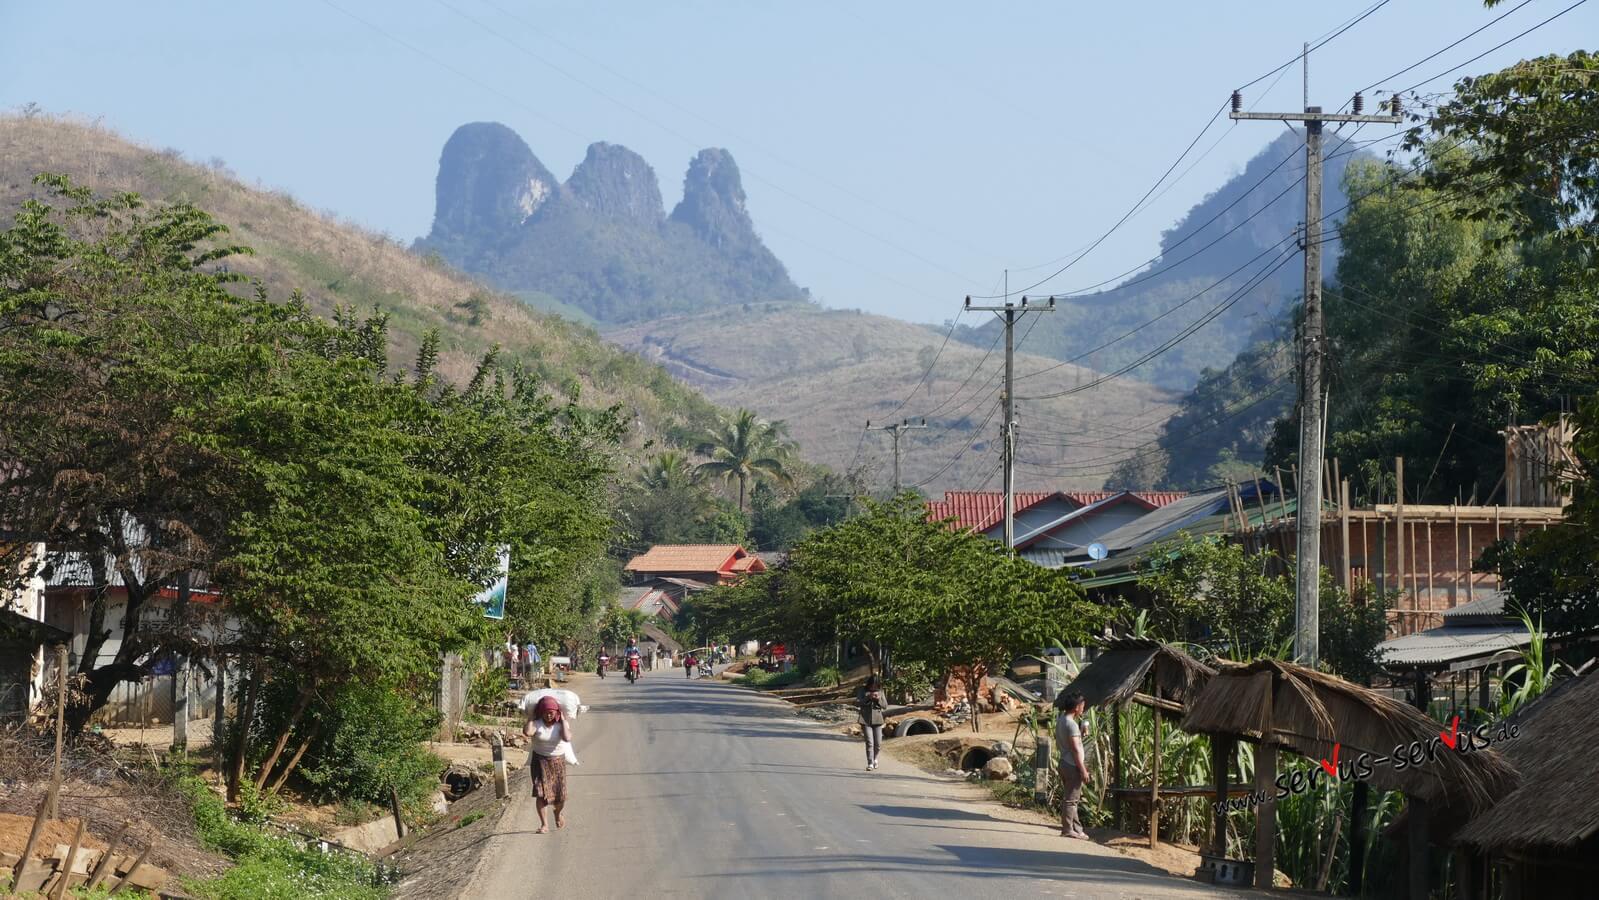 Laos, kartberge, straße